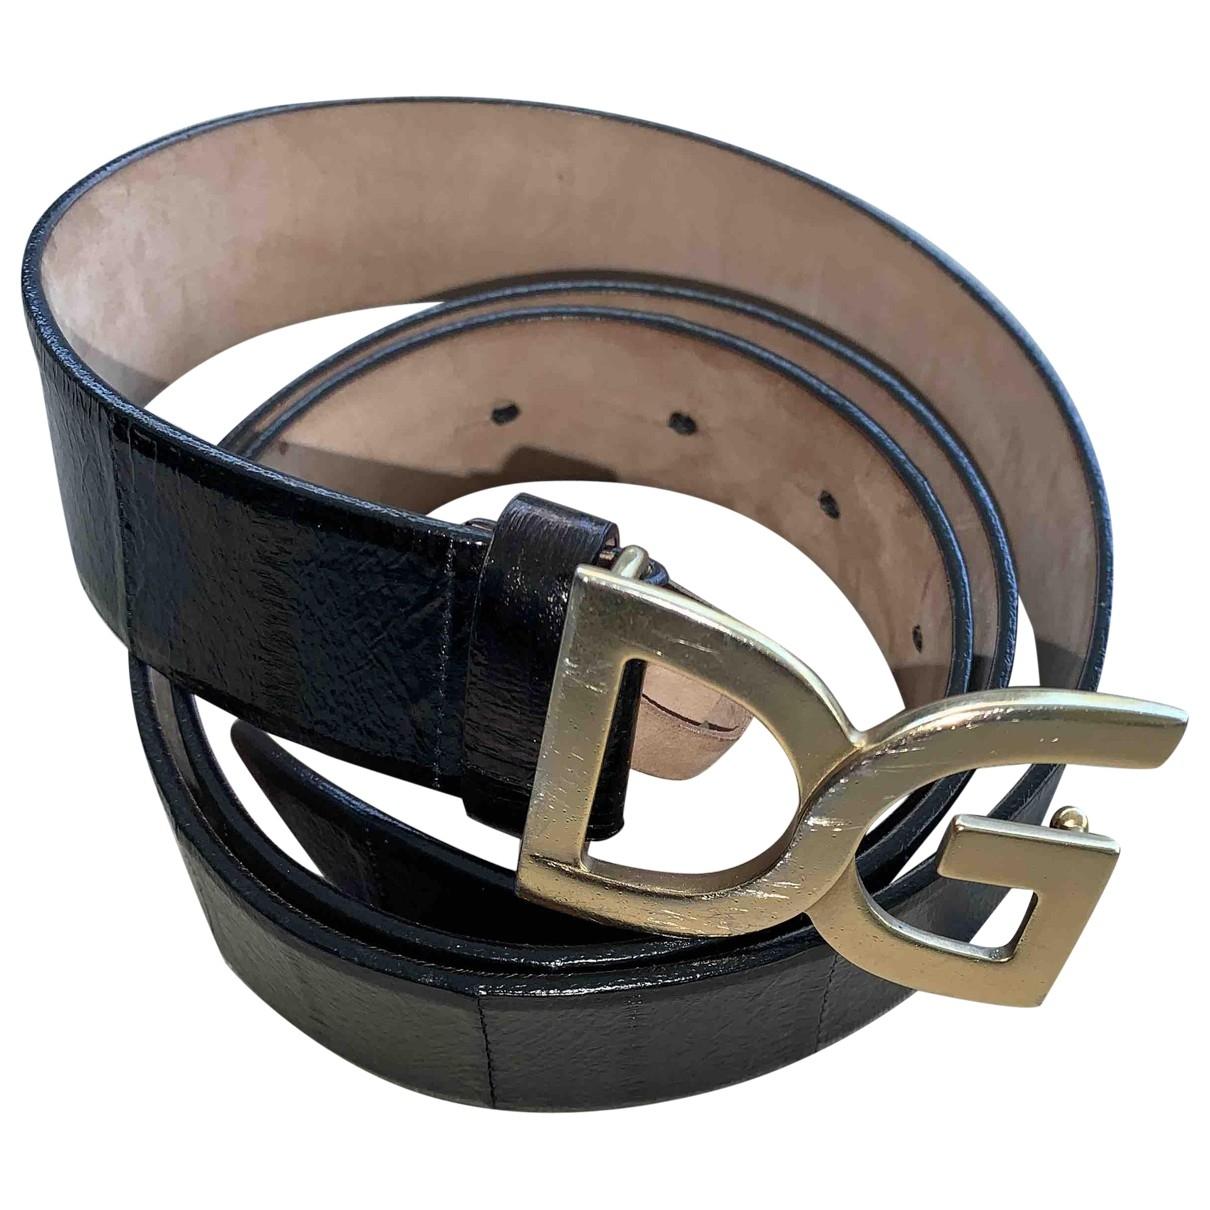 Dolce & Gabbana \N Black Leather belt for Women M International